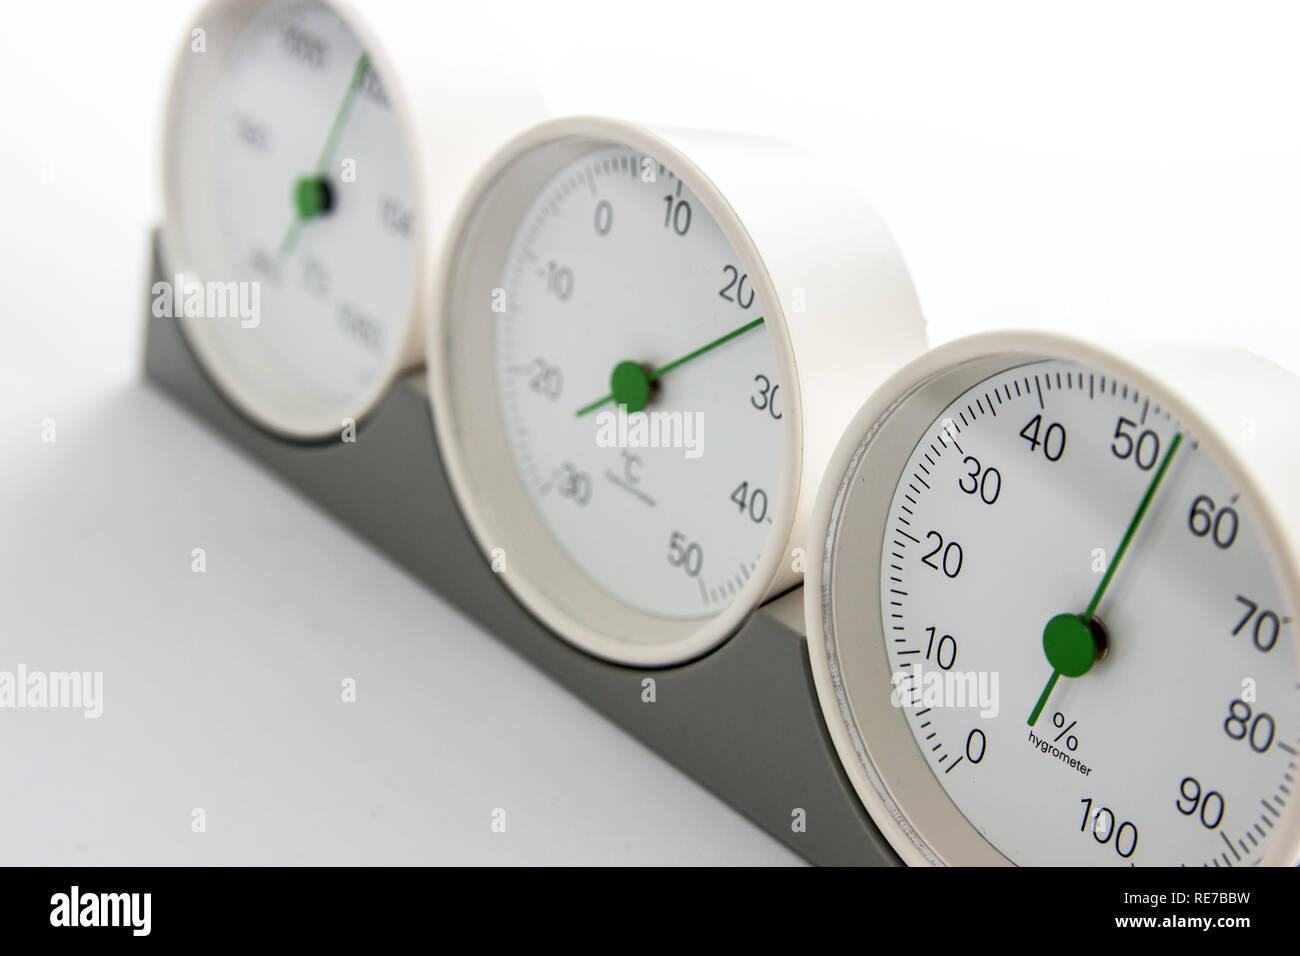 Objecta Vintage Barometer Thermometer Analog, Hygrometer auf Holzuntergrund